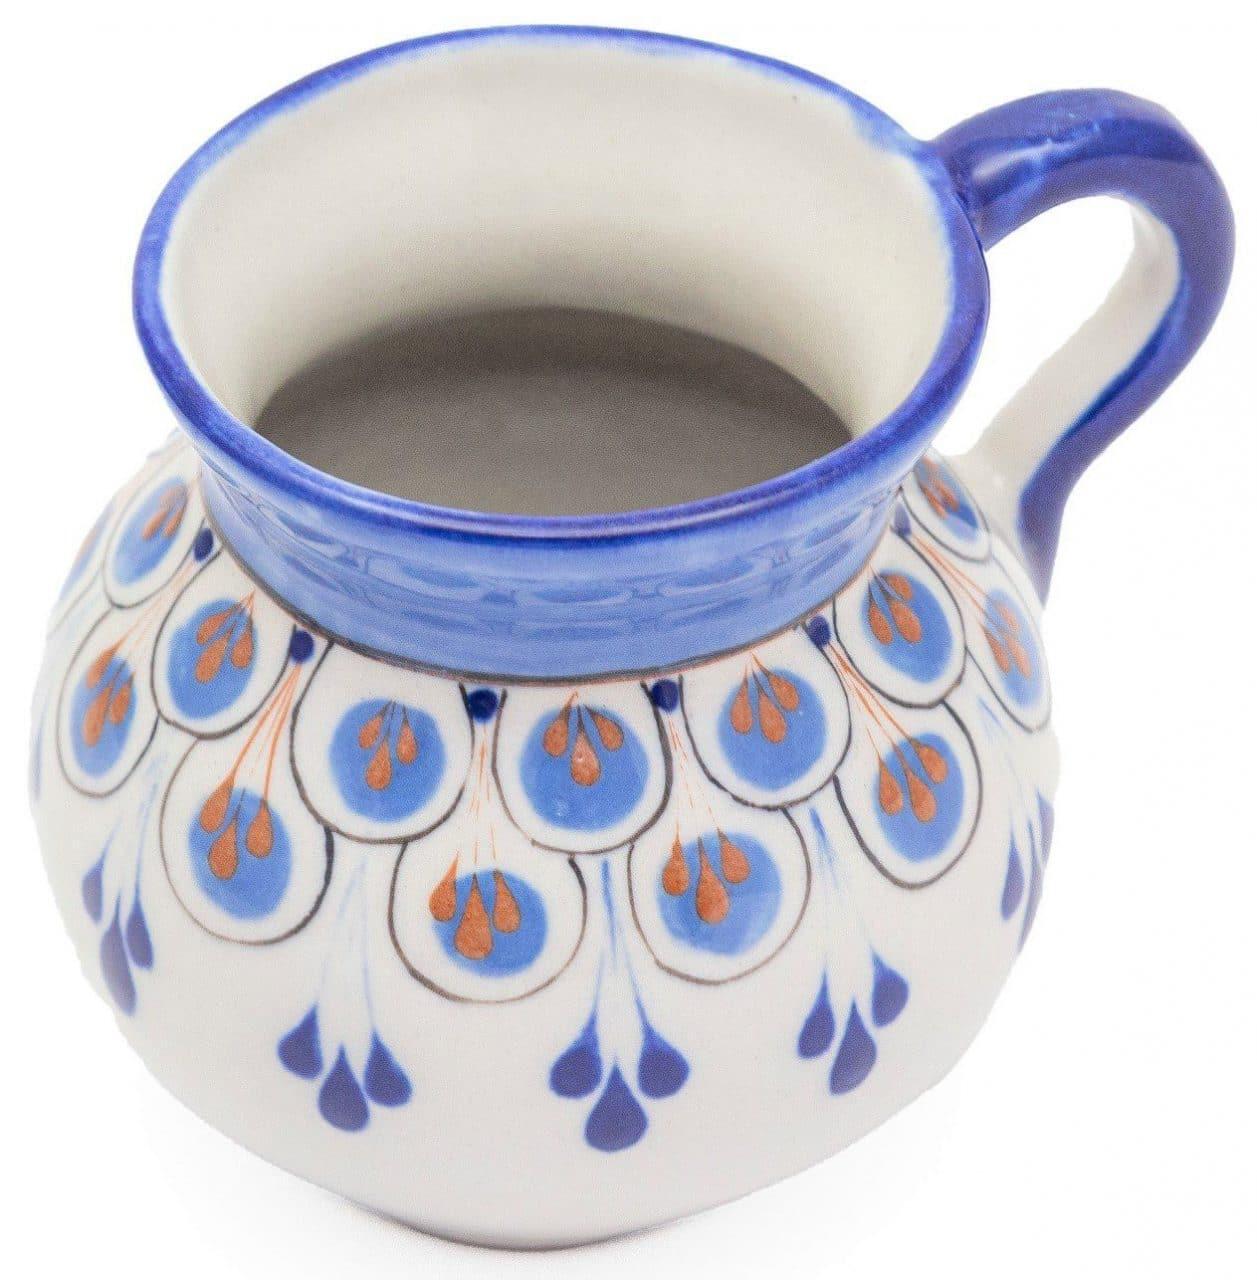 Hand-Painted Stoneware Mug - A Variety of Colors